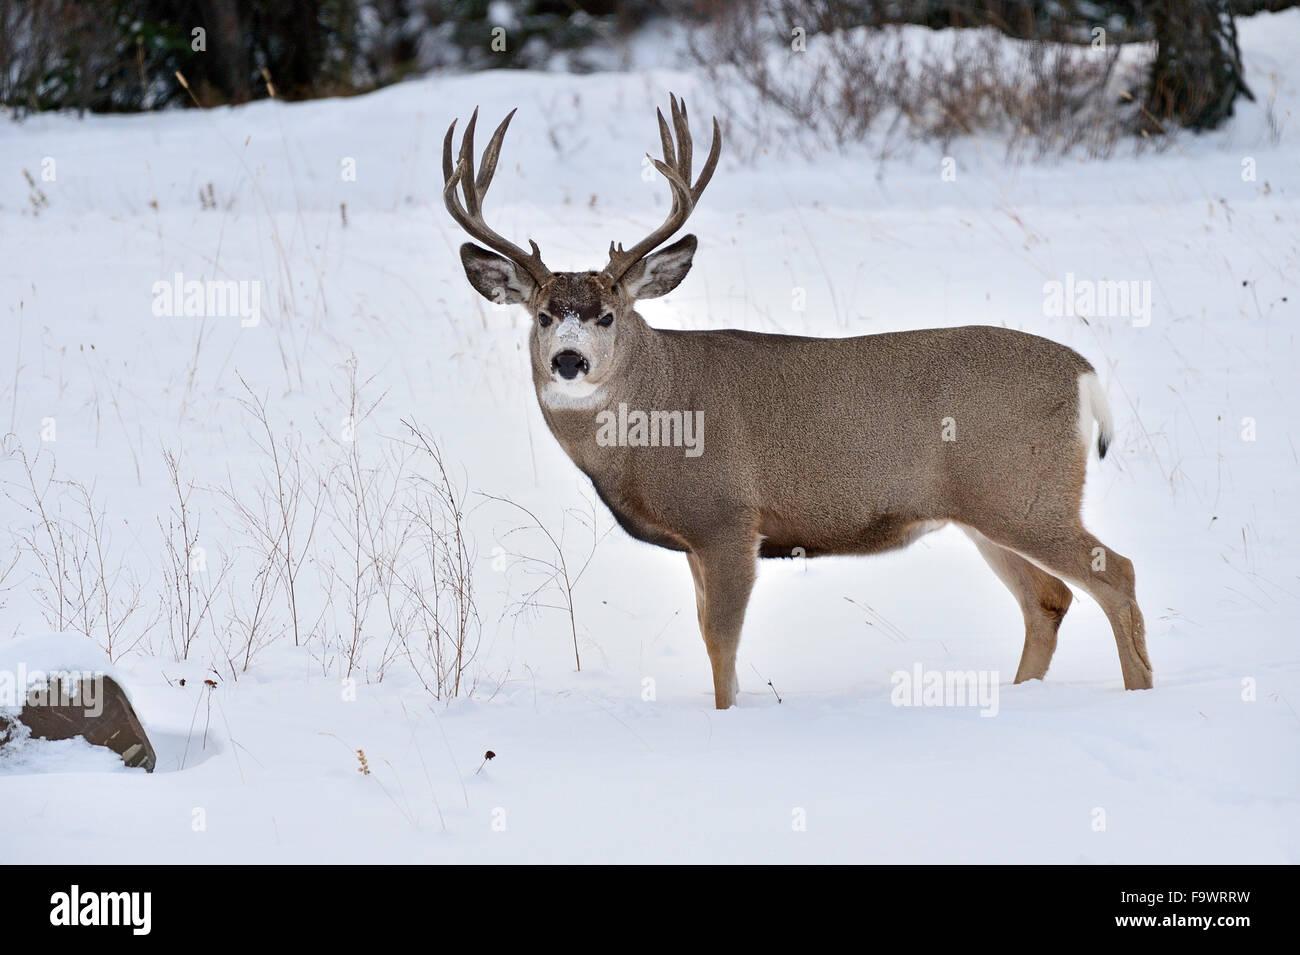 A mule deer buck  Odocoileus hemionus; standing in the fresh snow in rural Alberta Canada. - Stock Image